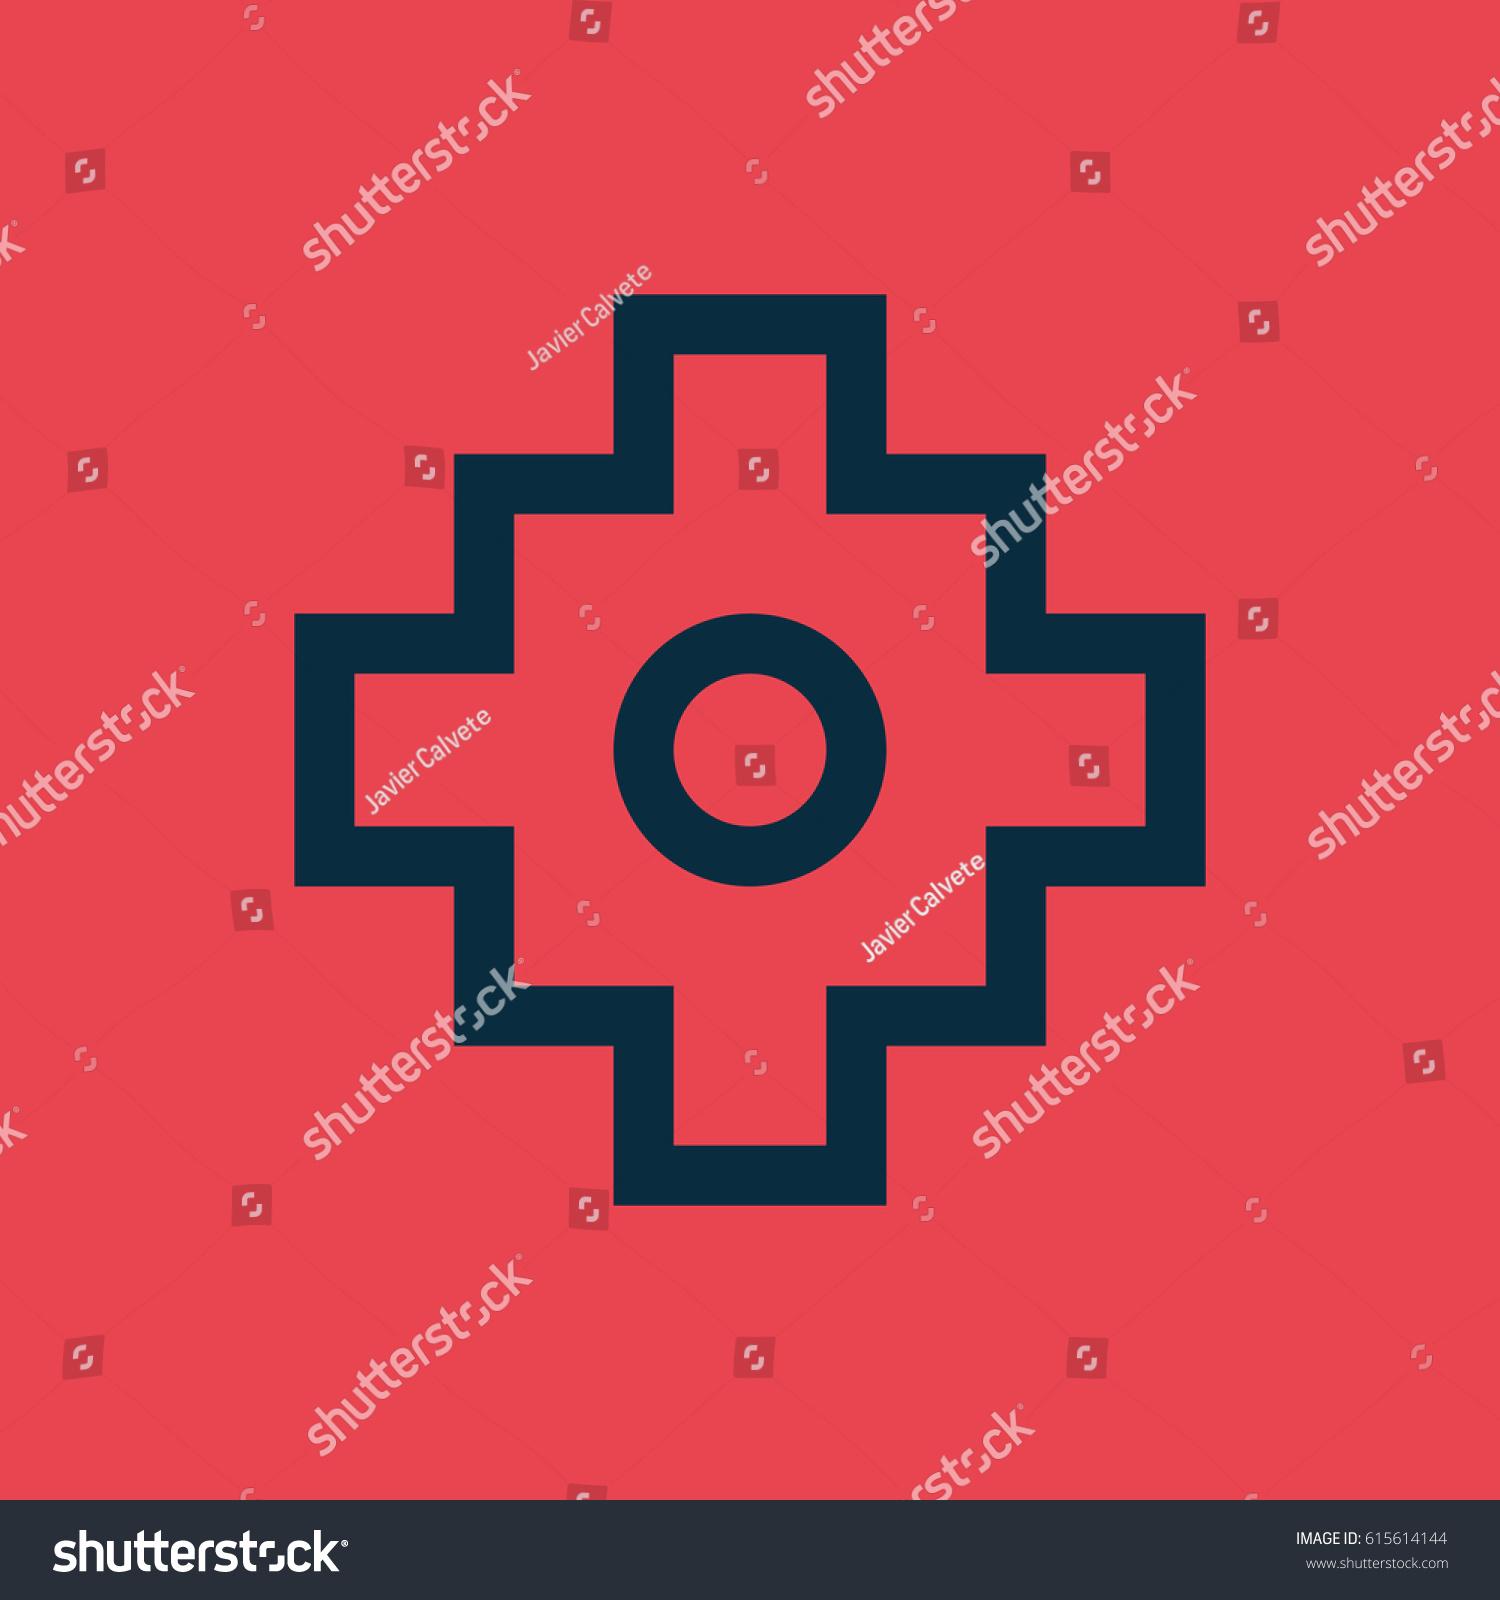 Tumaco symbol colombian culture stock vector 615614144 shutterstock tumaco symbol colombian culture buycottarizona